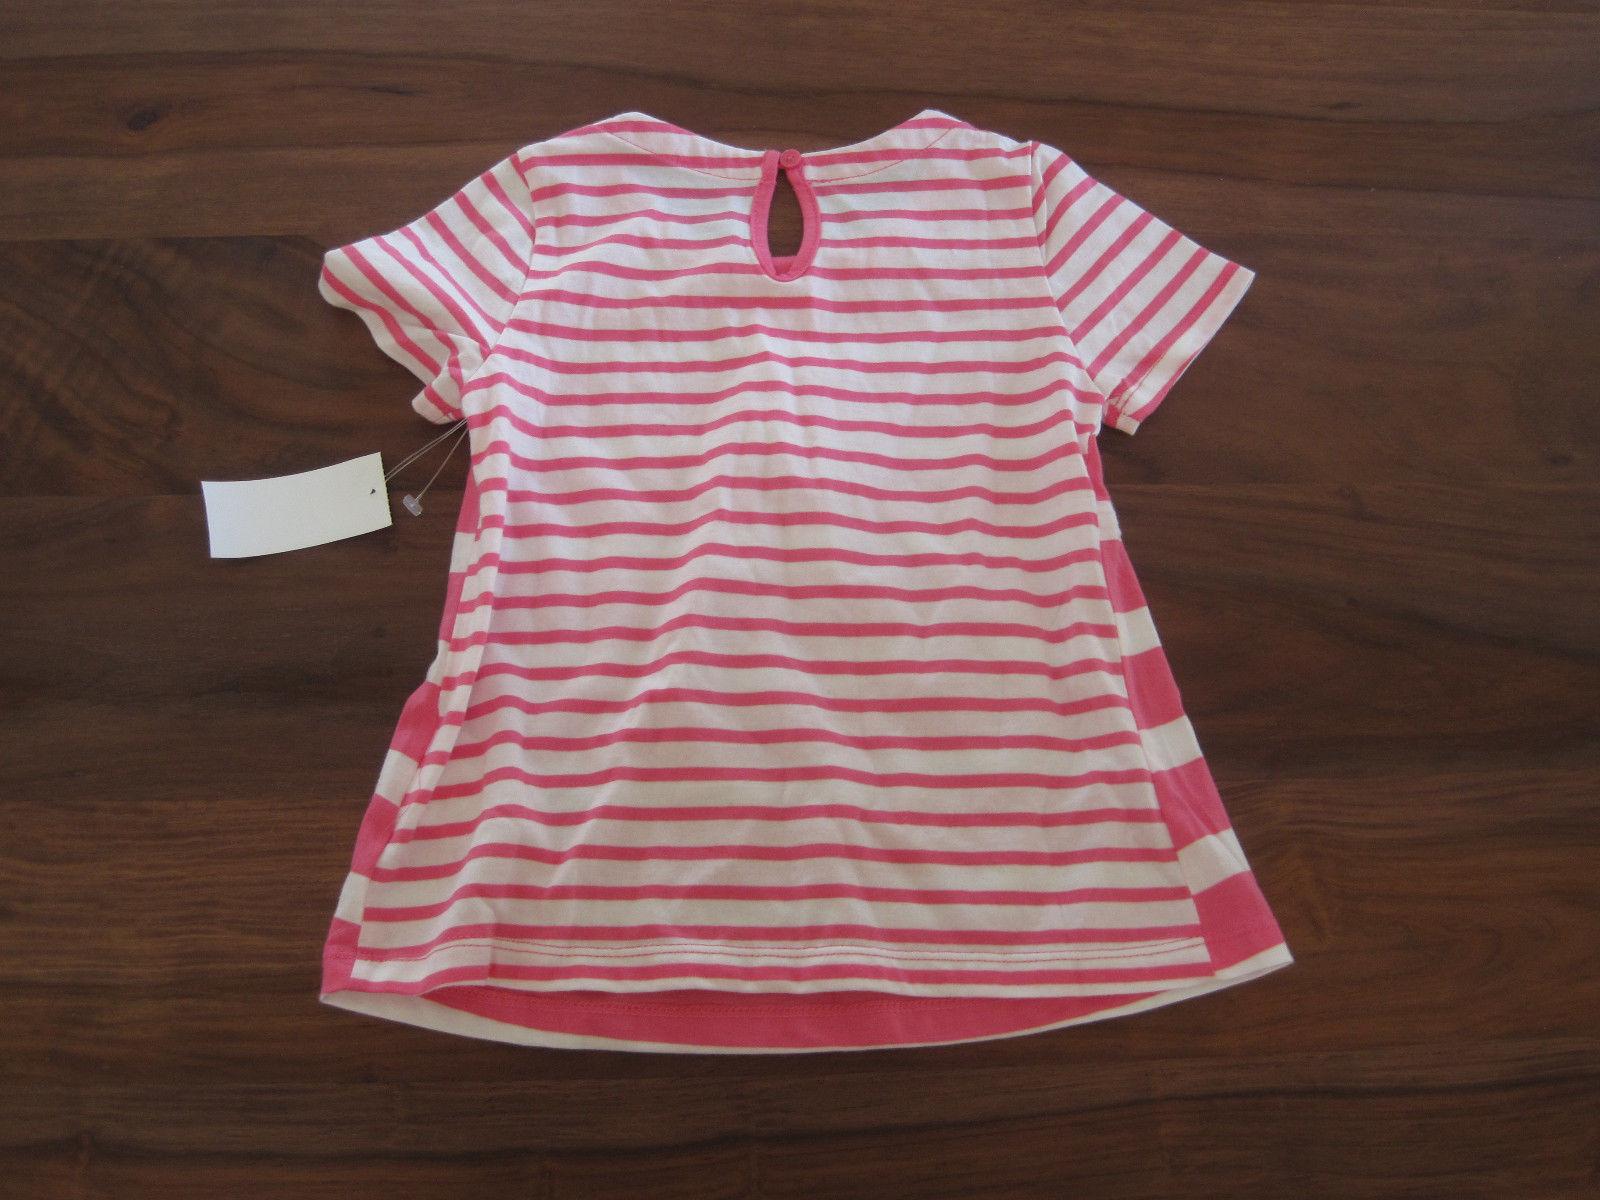 GAP Kids Girls T-shirt Top Sz 5 Pink Striped Pleated Cotton Crew Neck New